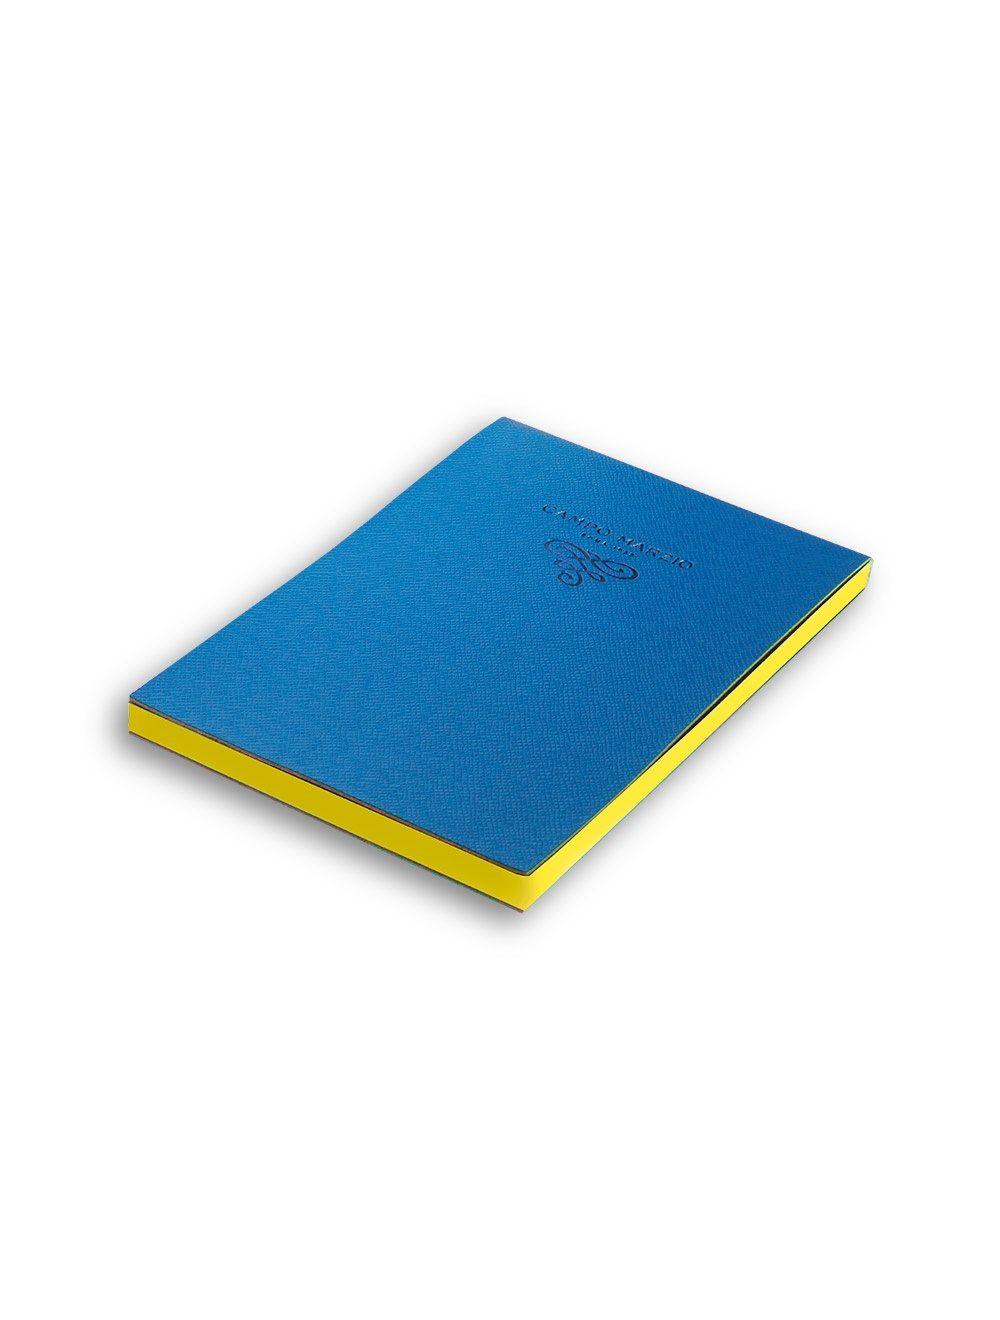 Notes 11x16 cm Saffiano - Ocean Blue